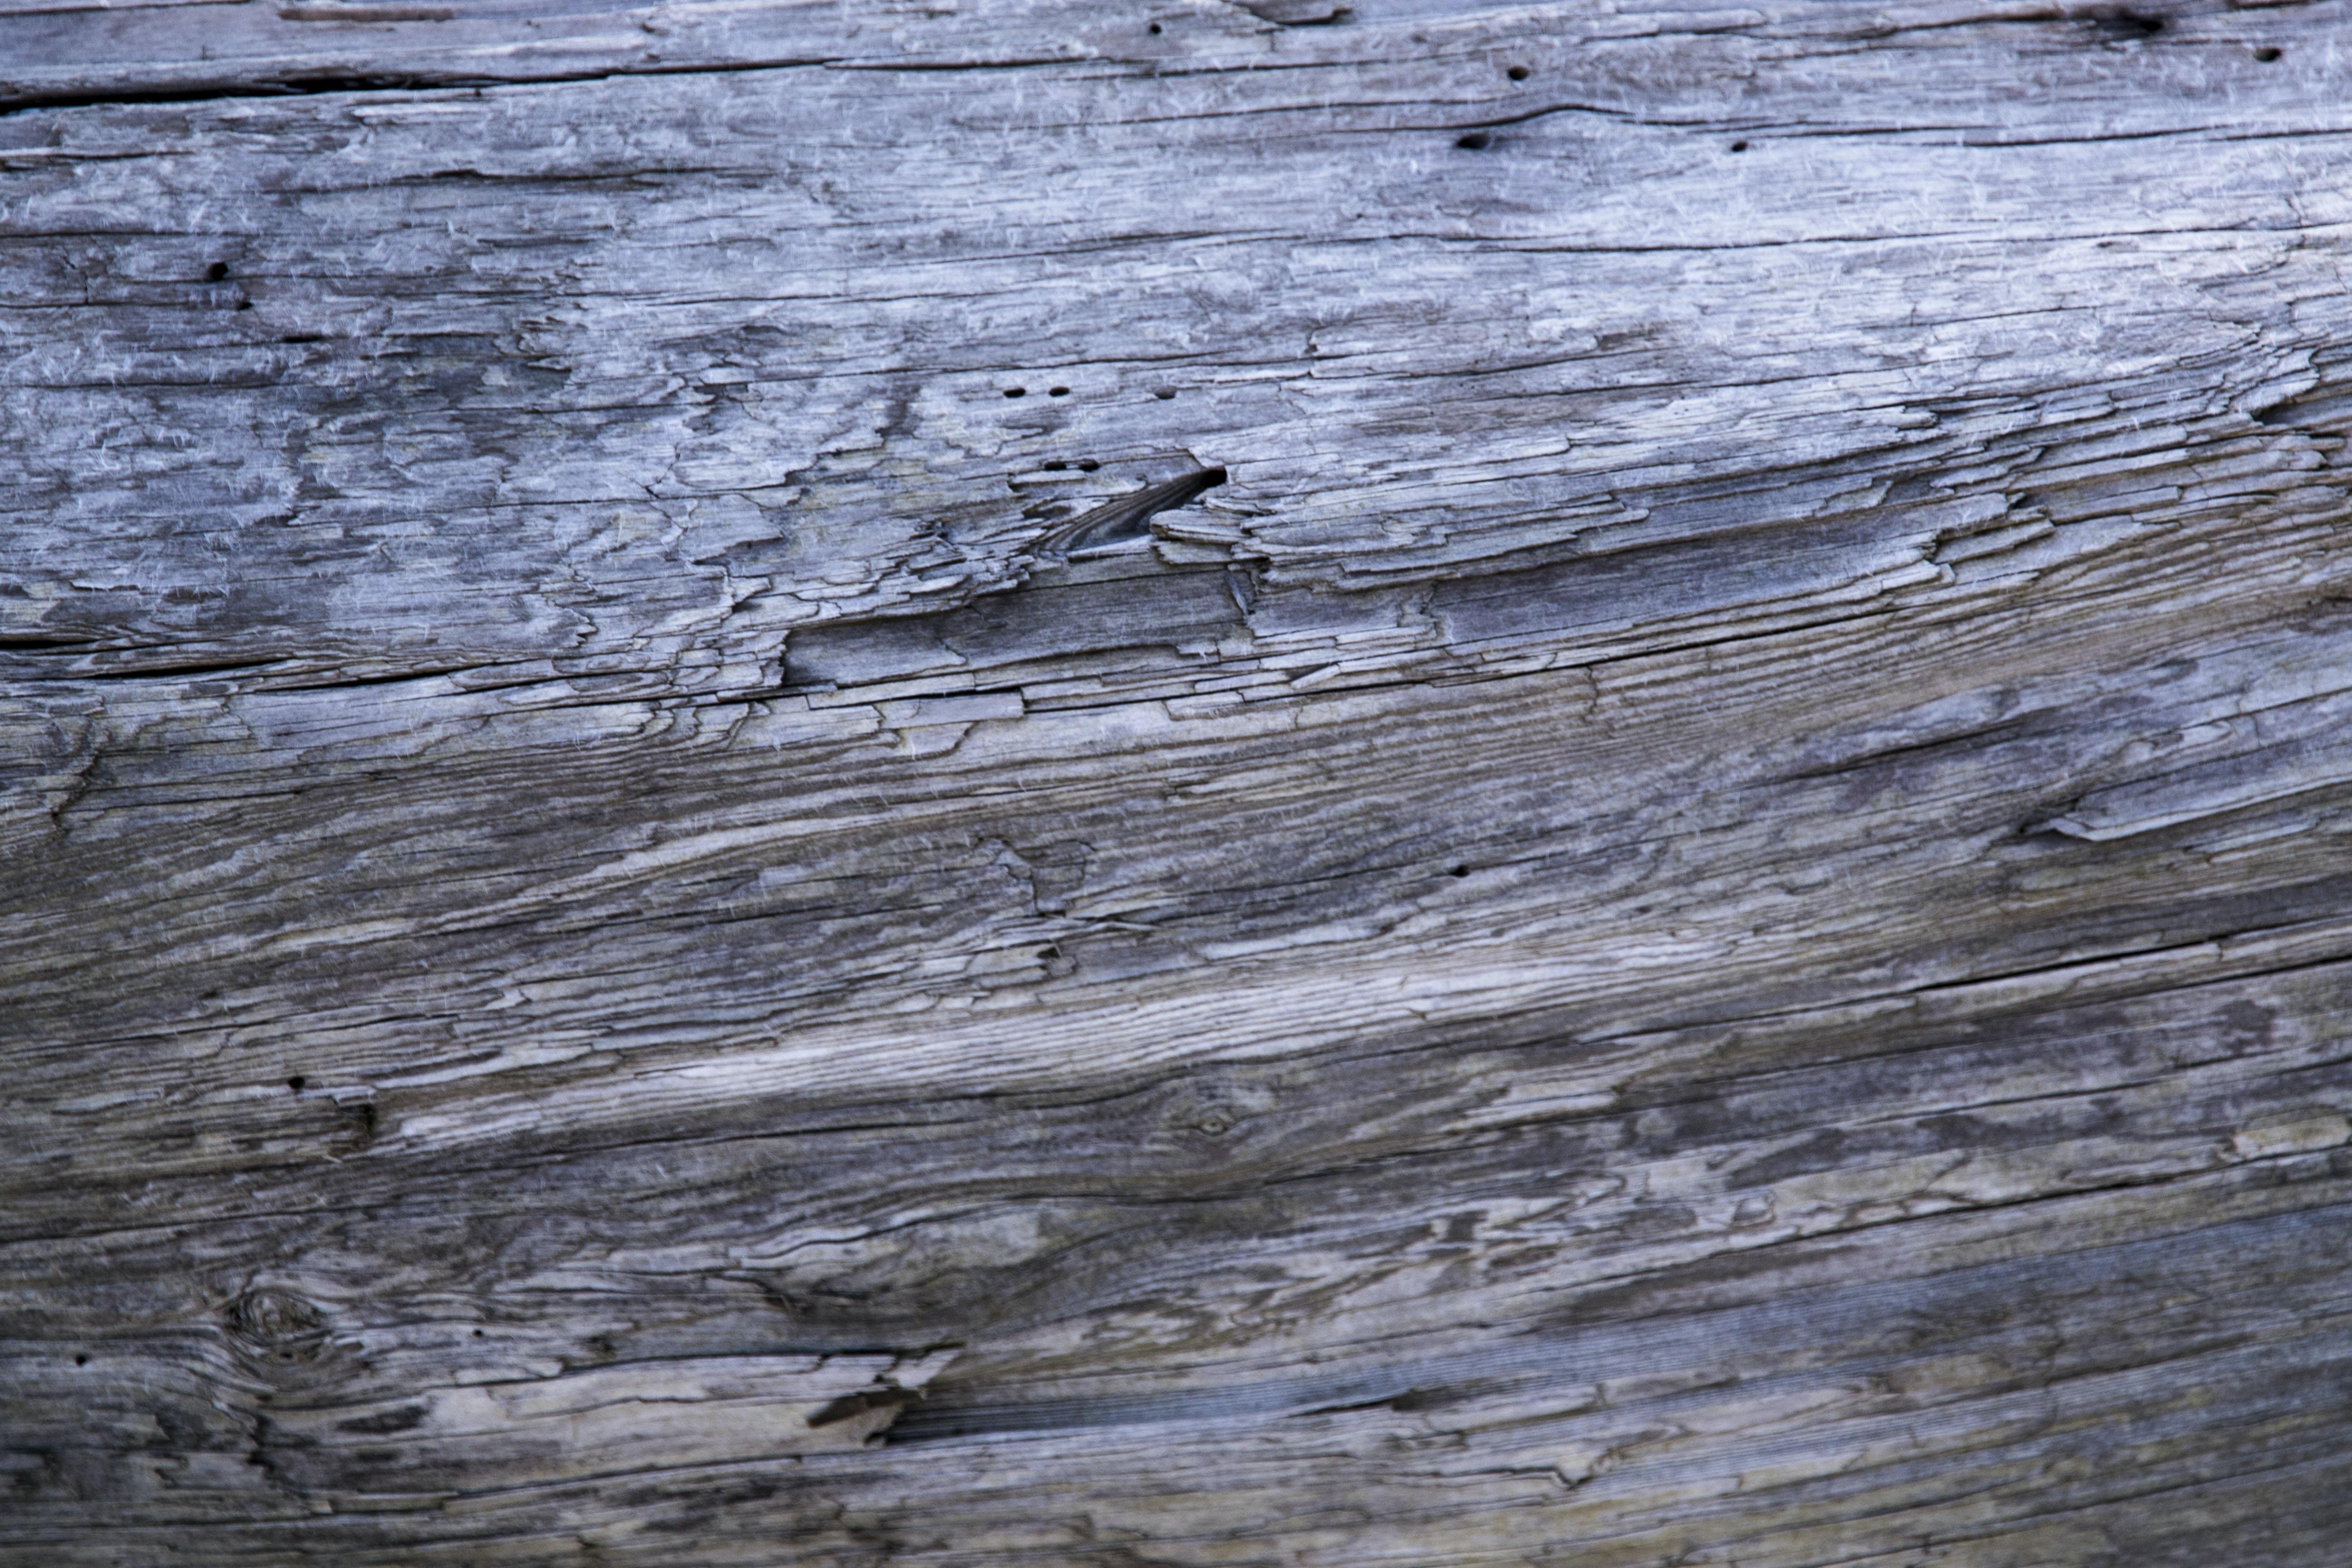 closeup photo of gray wood trunk